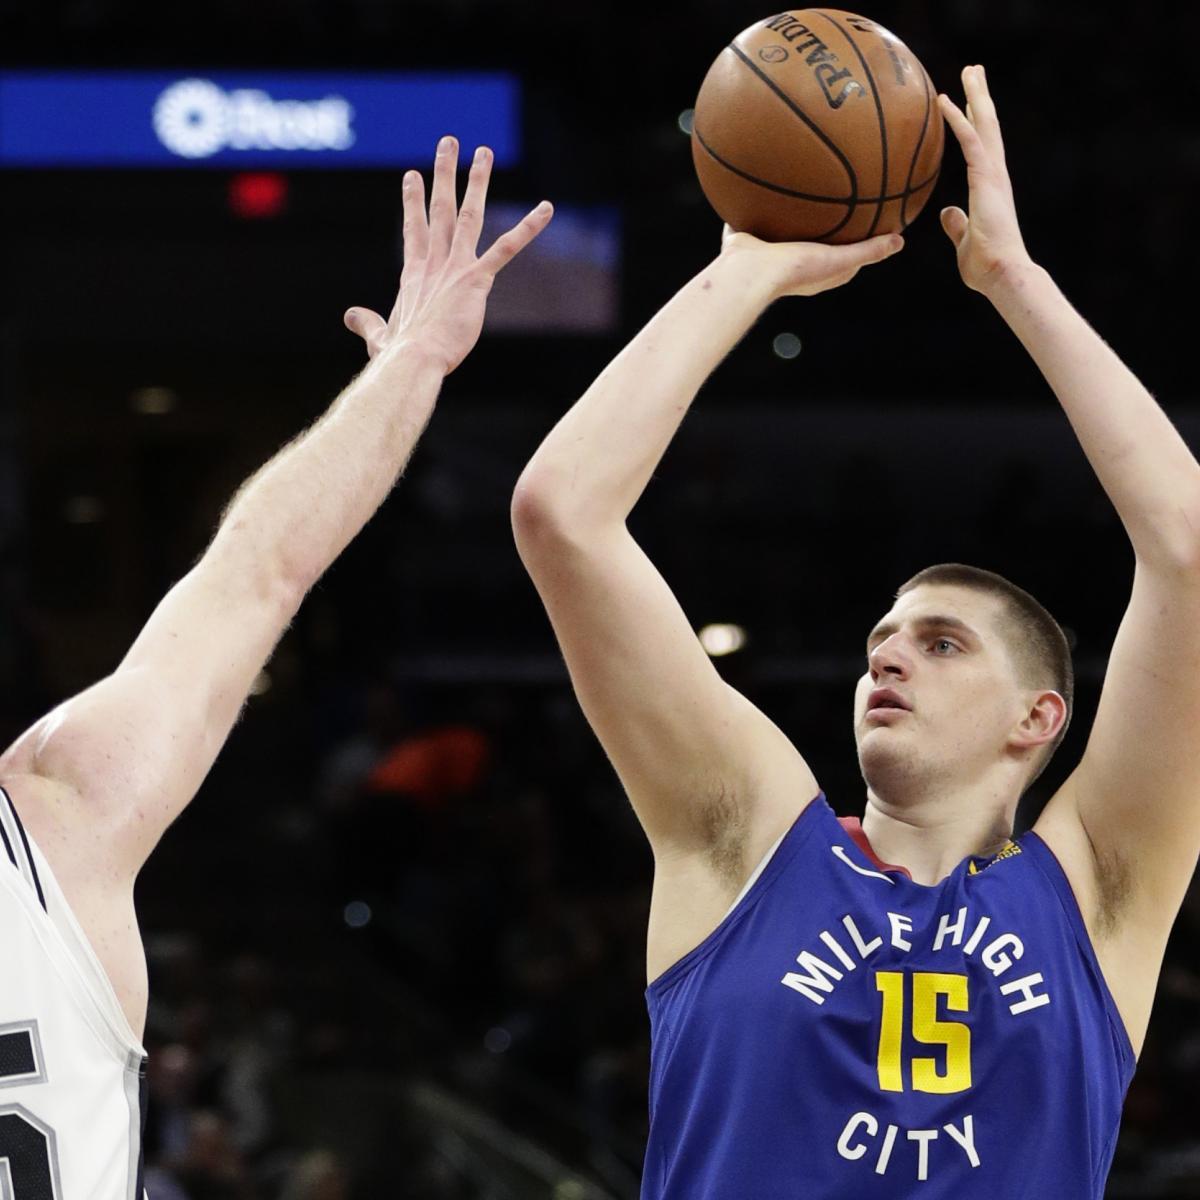 Nuggets Quarter Season Tickets: NBA Playoffs 2019: Latest Postseason Bracket, Standings